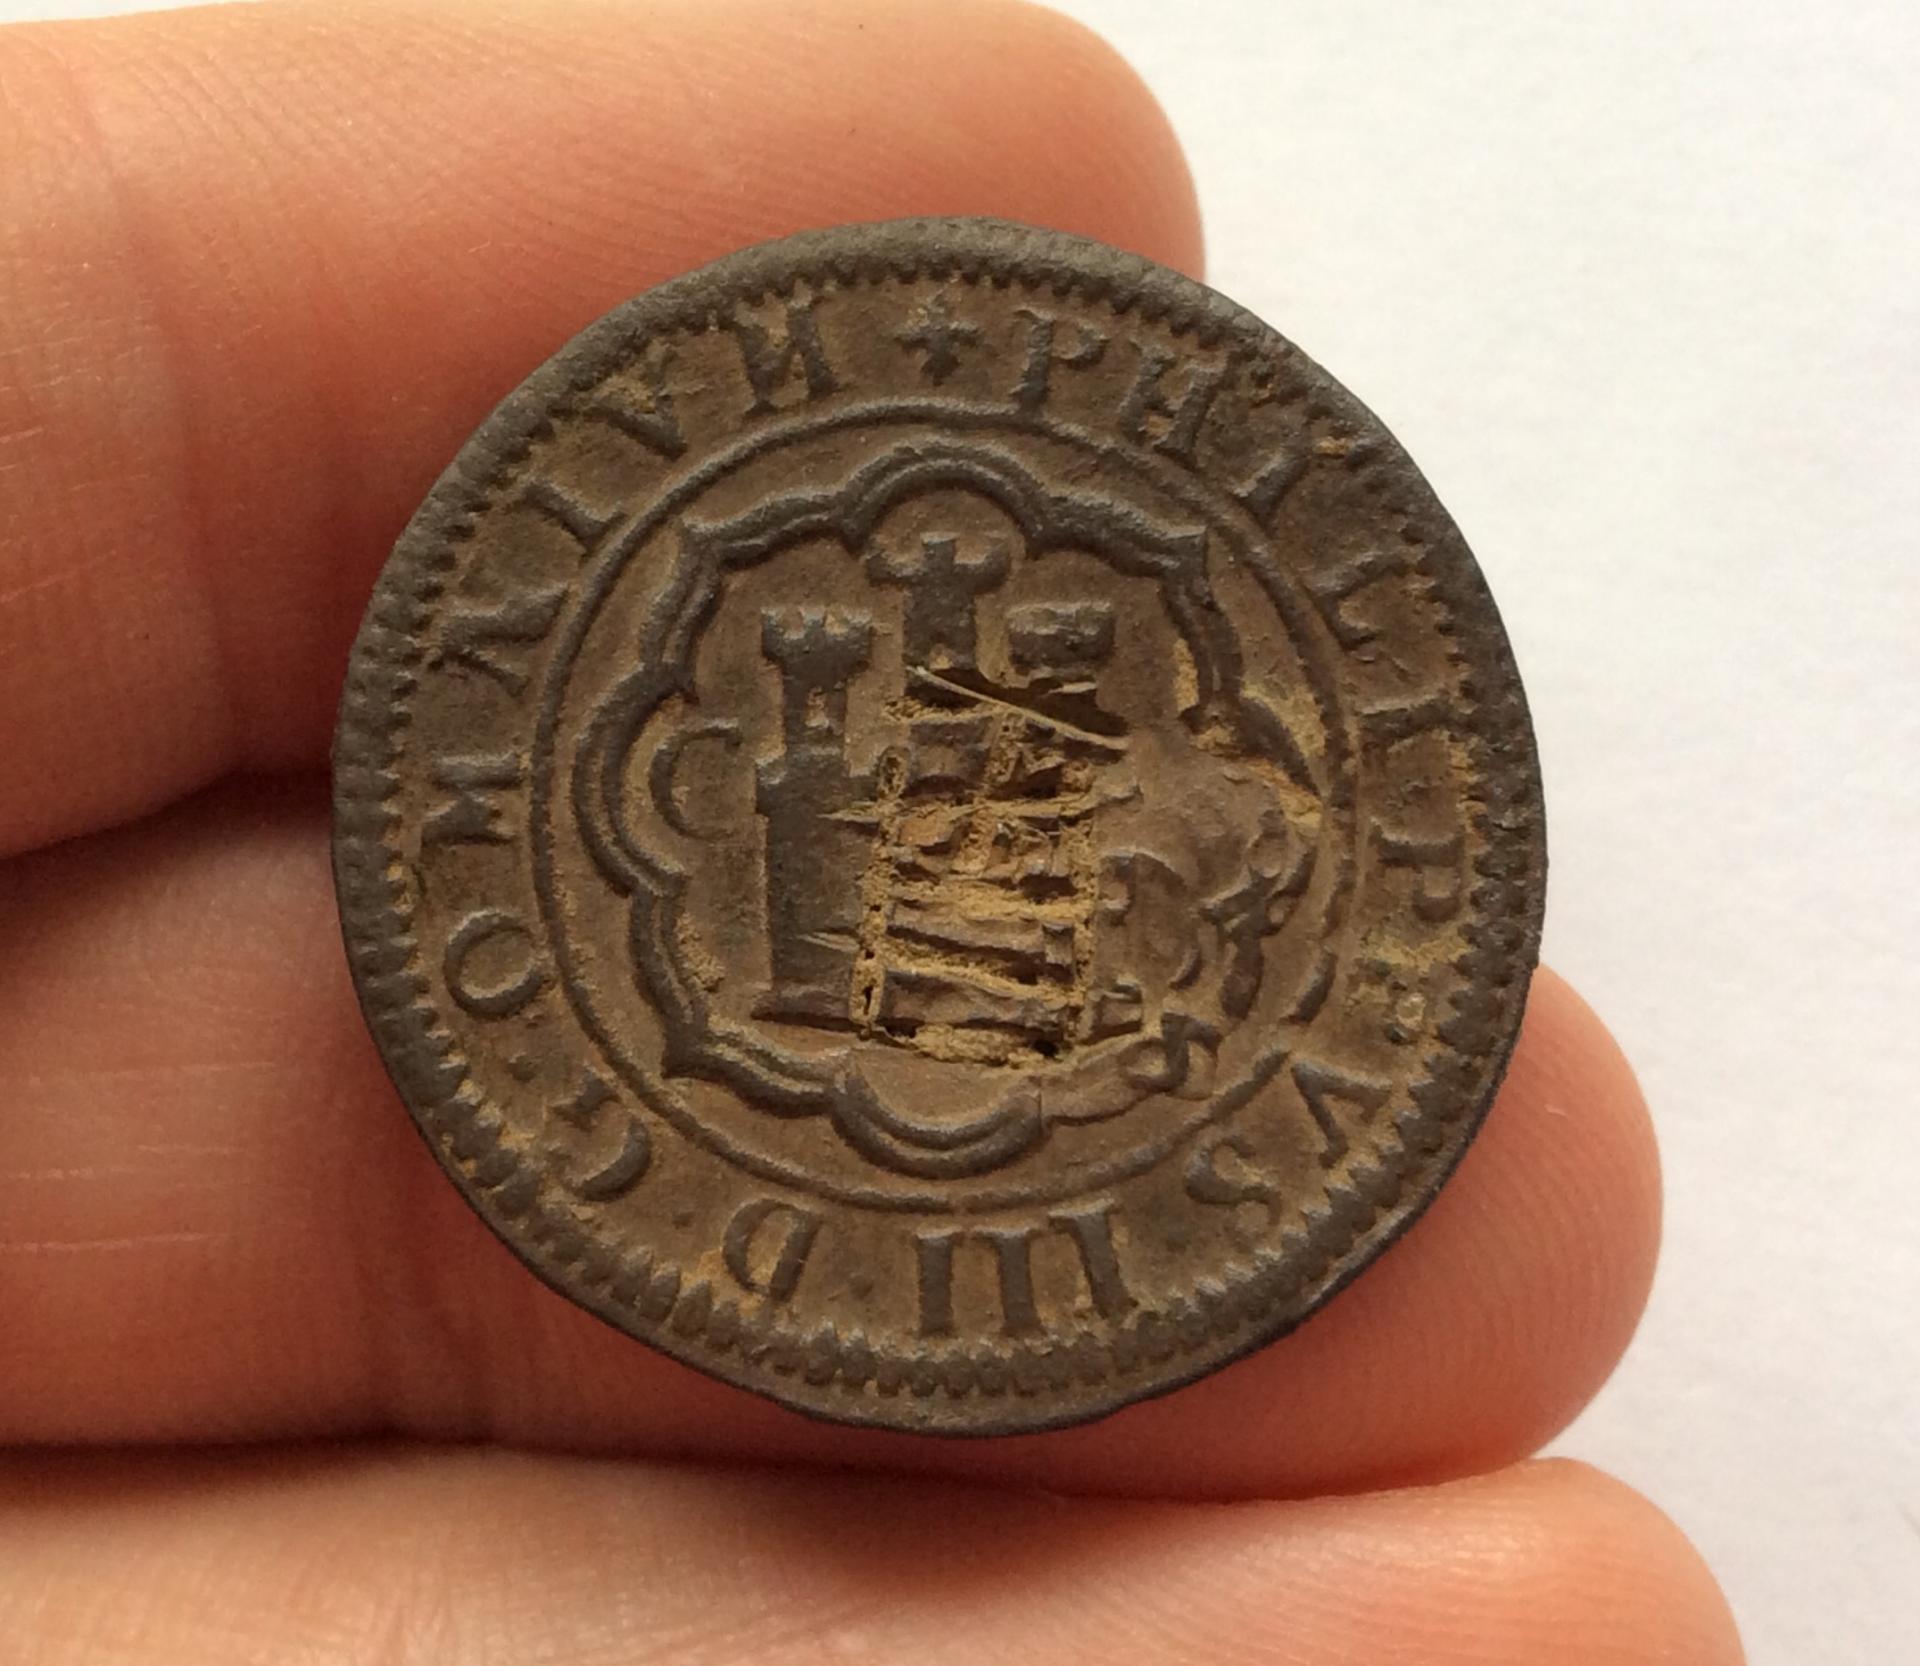 8 MARAVEDIS 1601 - FELIPE III - CUENCA - TIPO OMNIVM